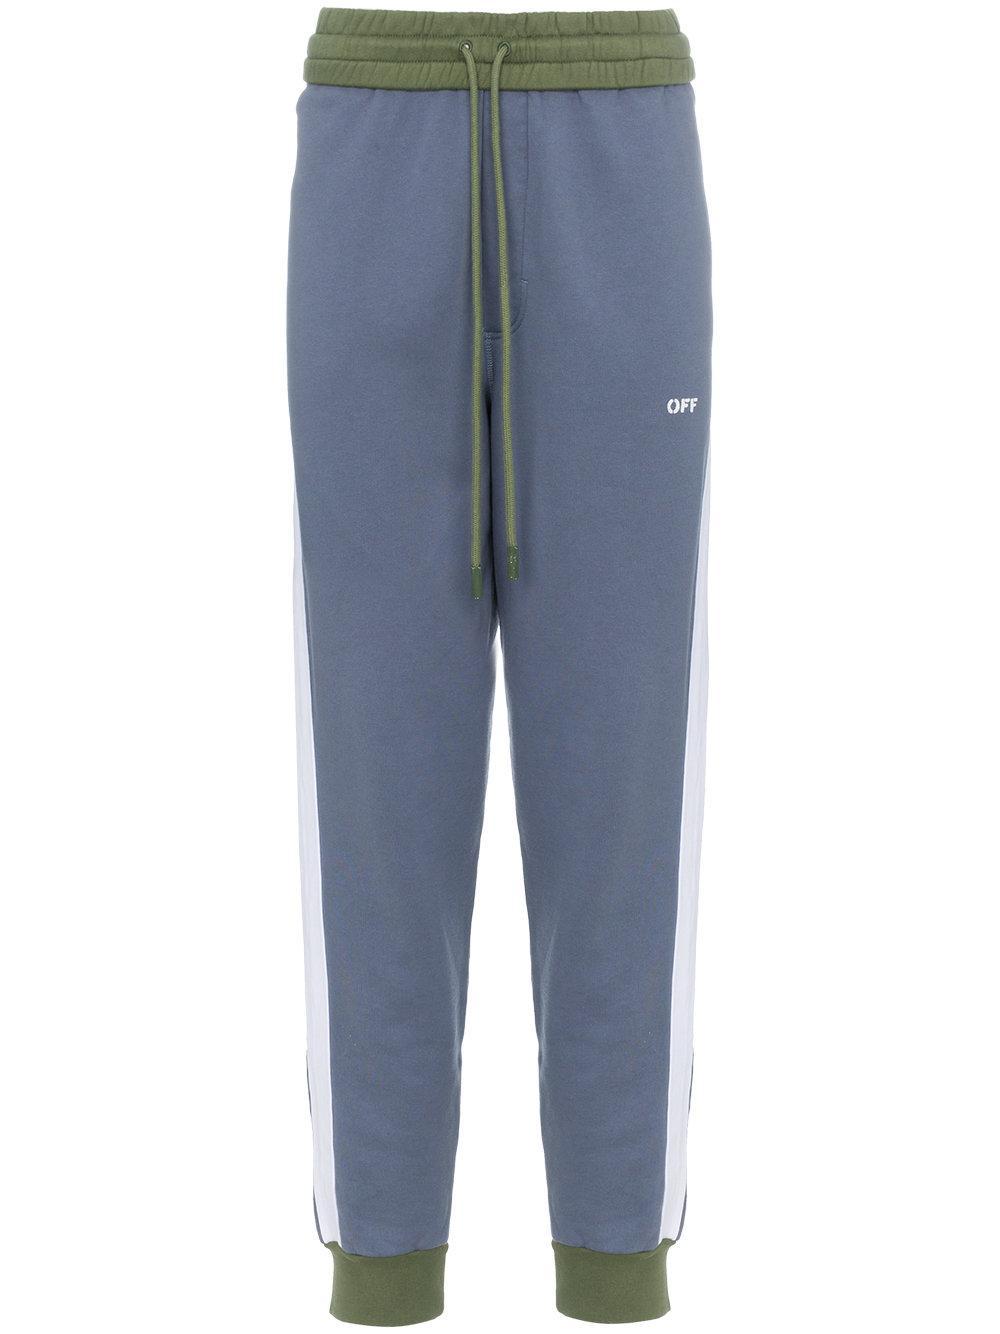 92c7137bbd31 Off-White X Browns Jogginghose - Blau In Blue